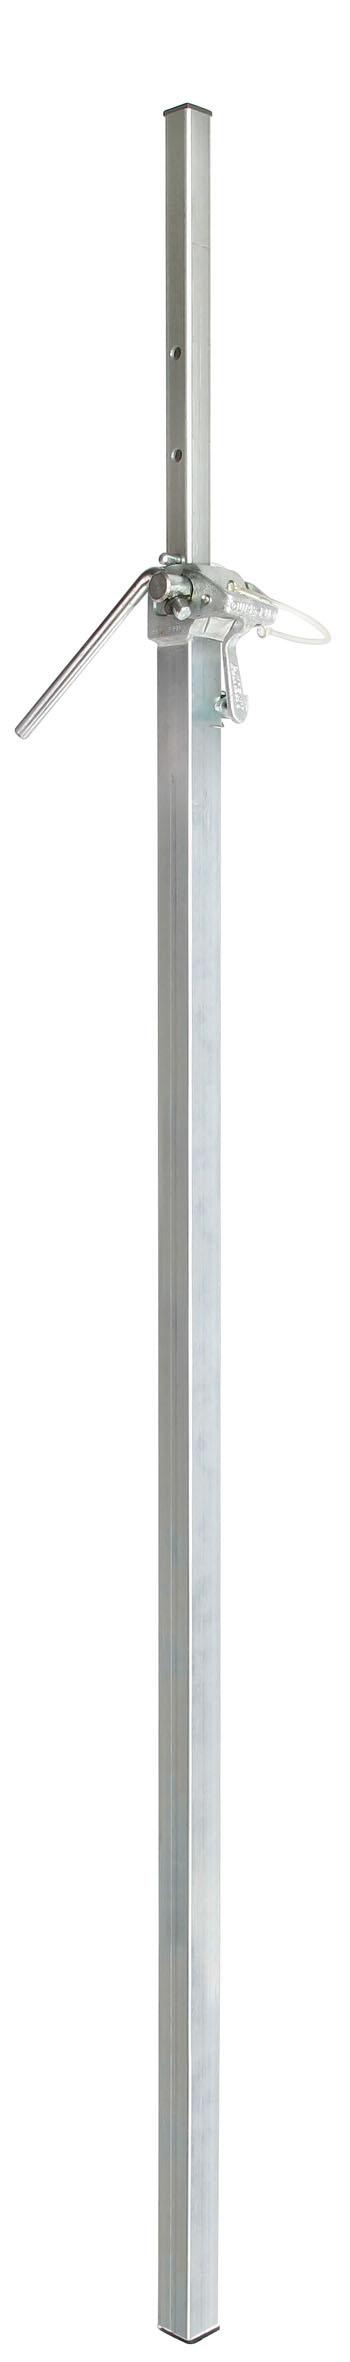 Coring Diamond acessories Diamond drilling accessories - anchoring - 373H.jpg